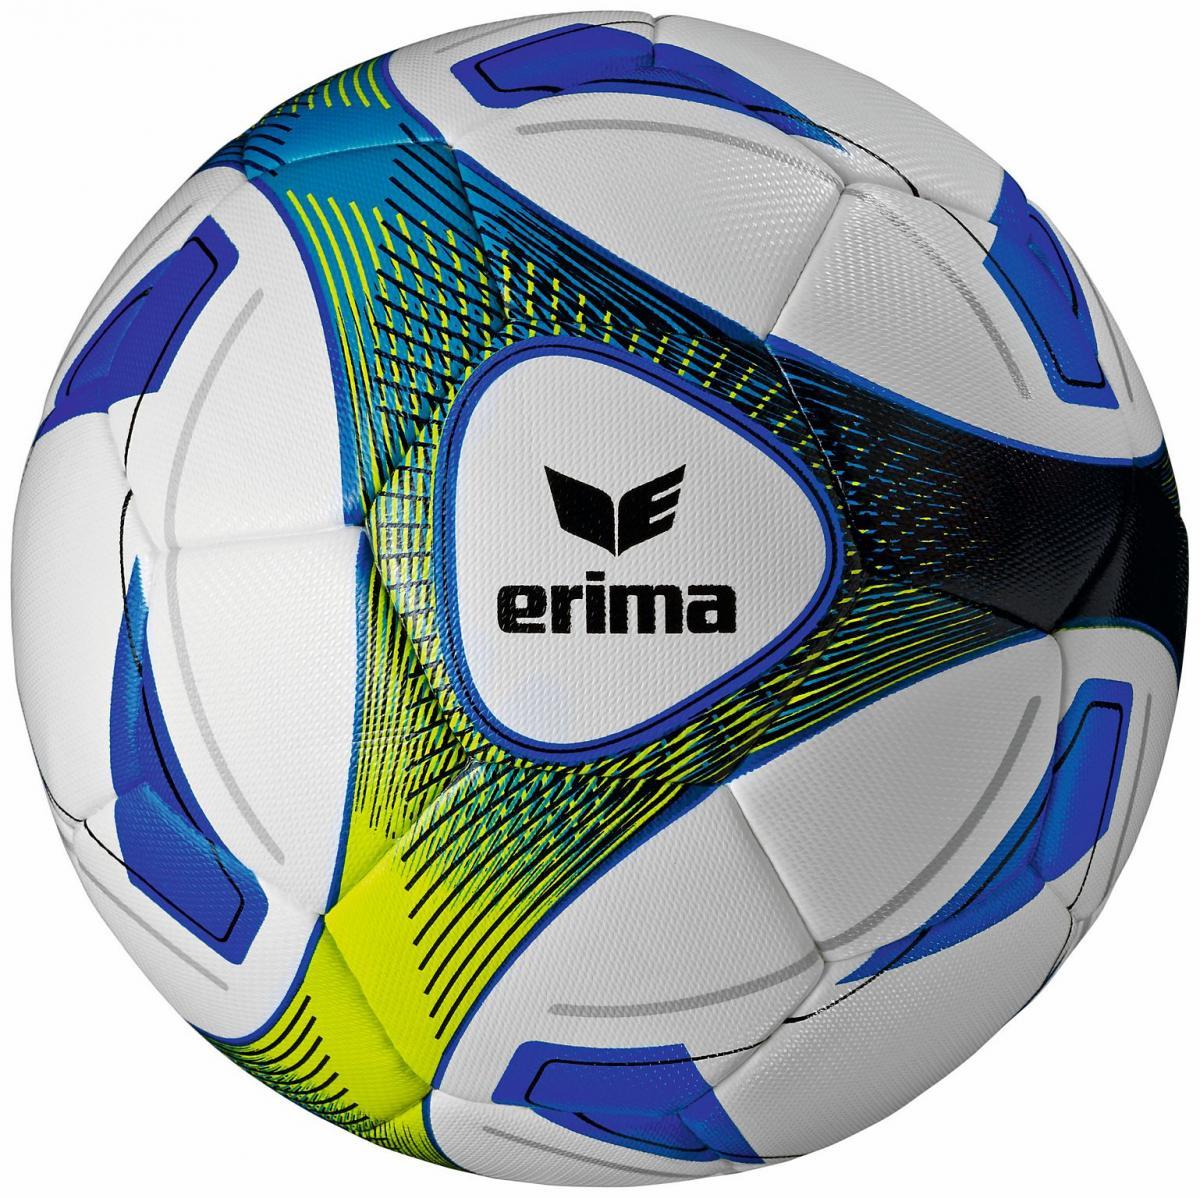 Erima Hybrid Training Fußball Trainingsball royallime | 5